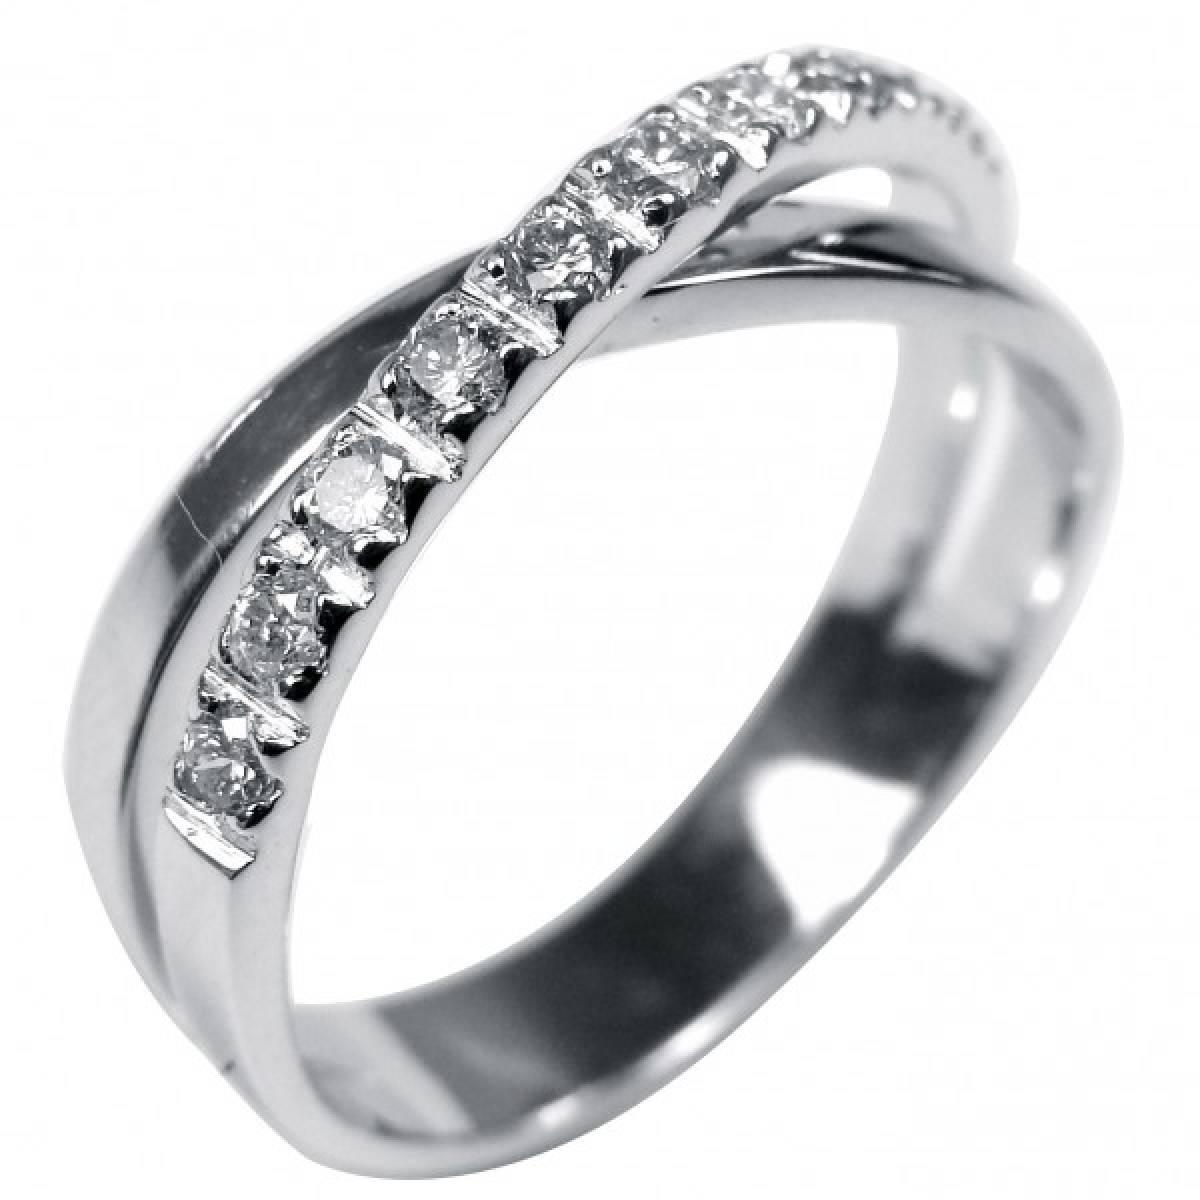 Anel de Noivado ouro branco de 19 kts com 10 diamantes de 0,33 cts